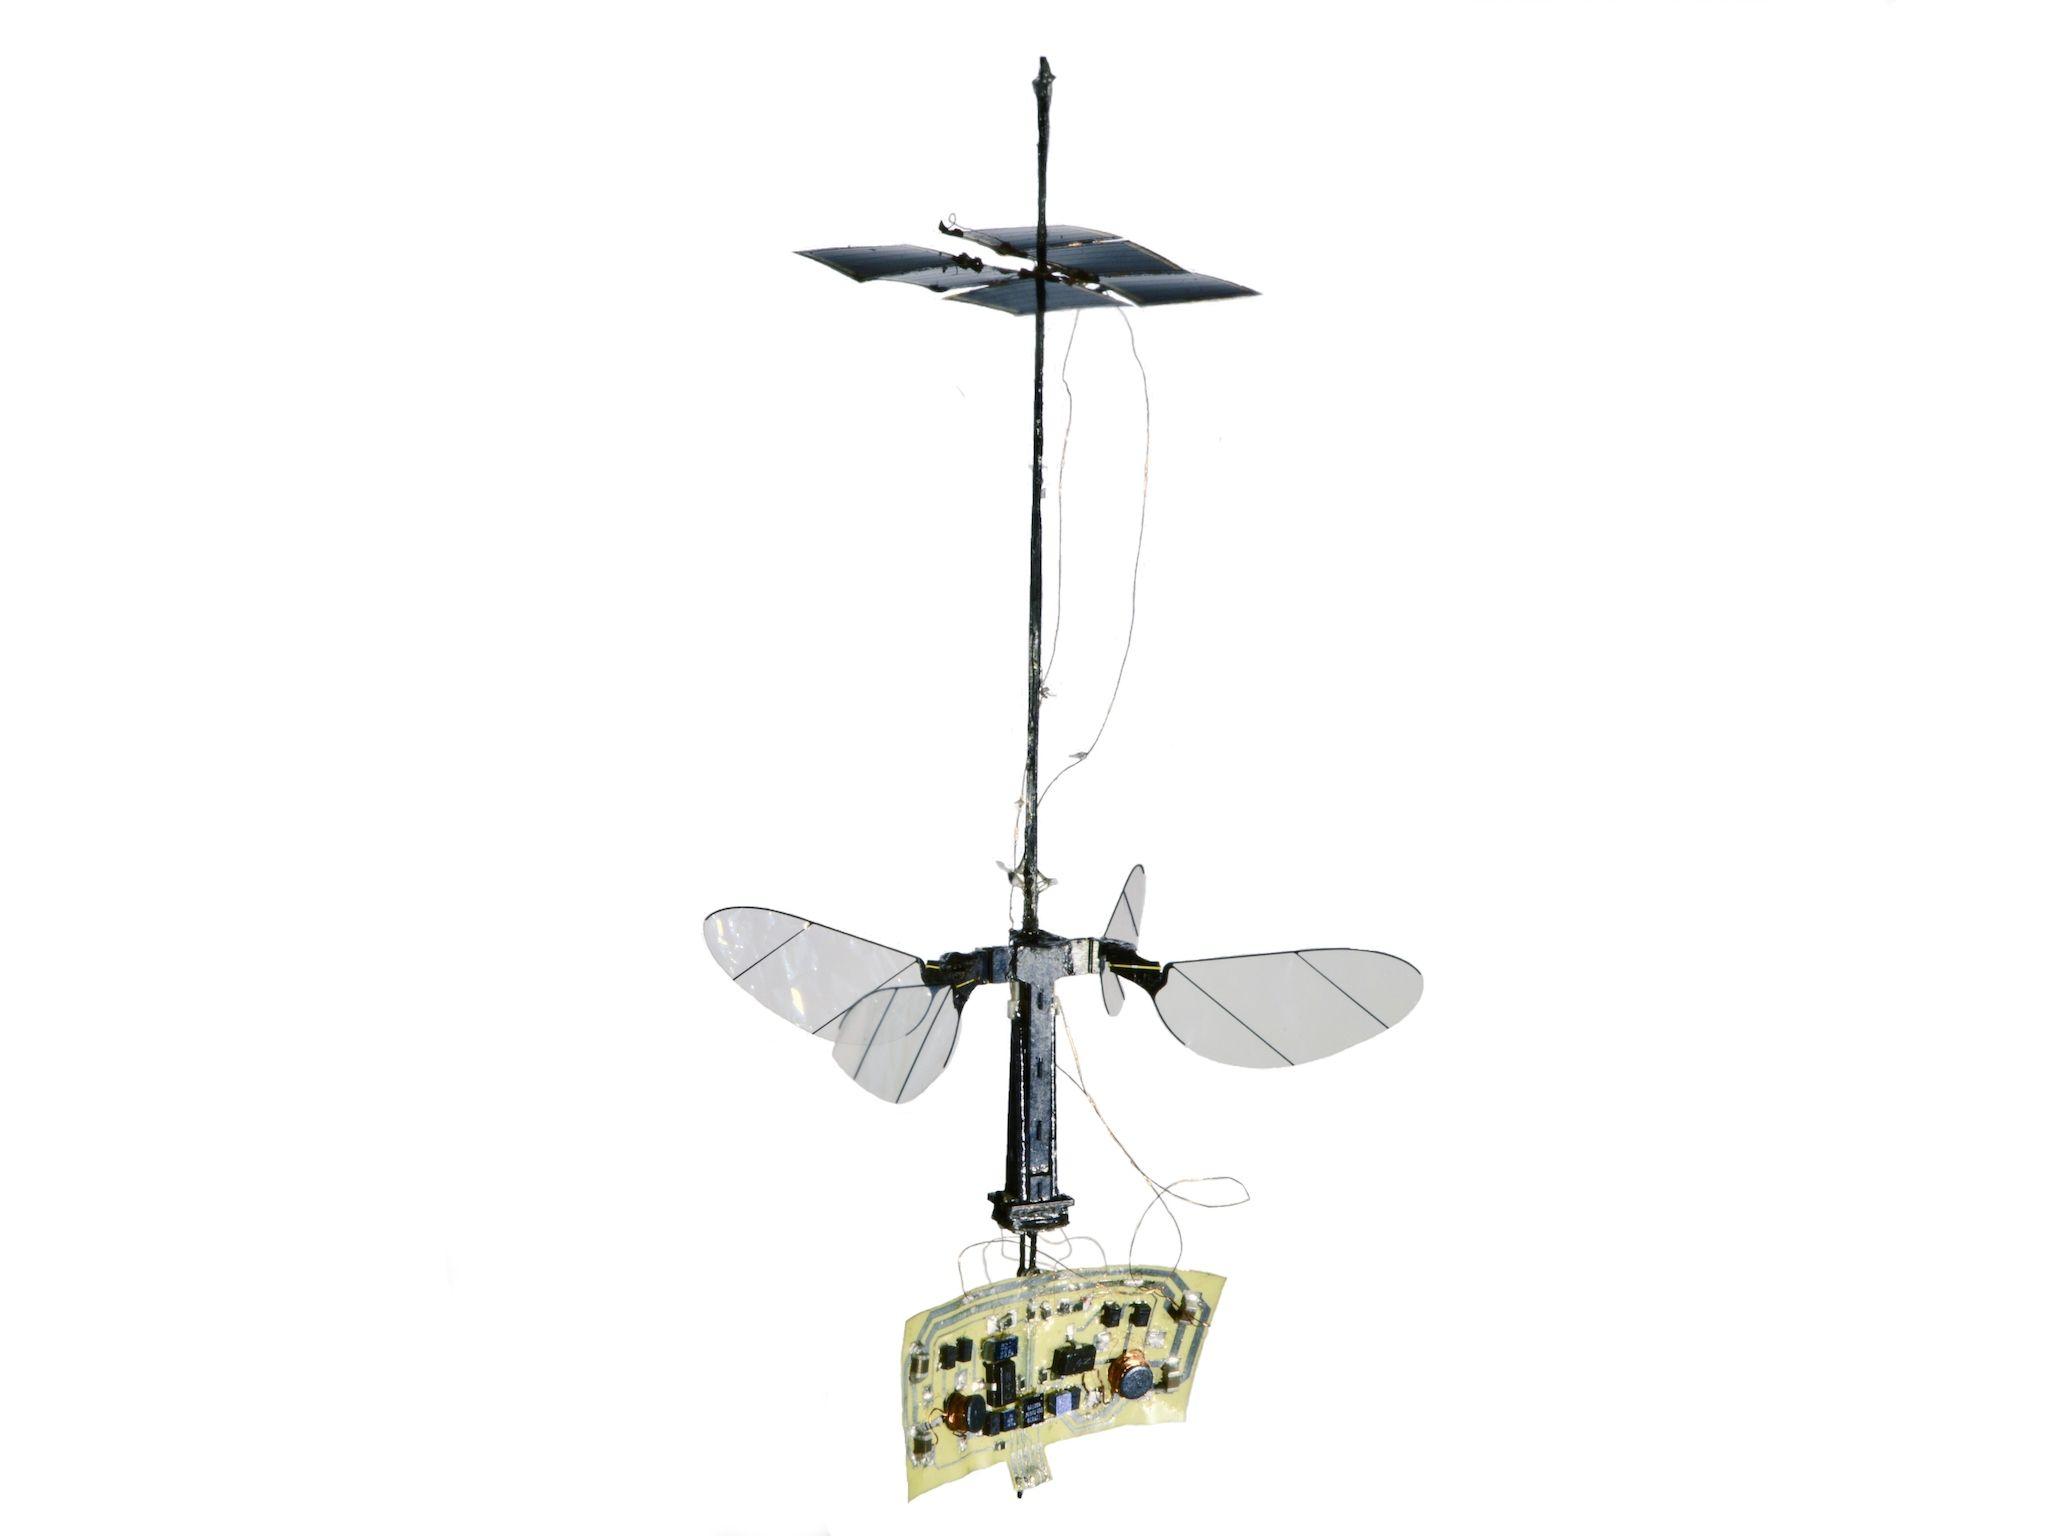 Solar-Powered RoboBee X-Wing Flies Untethered